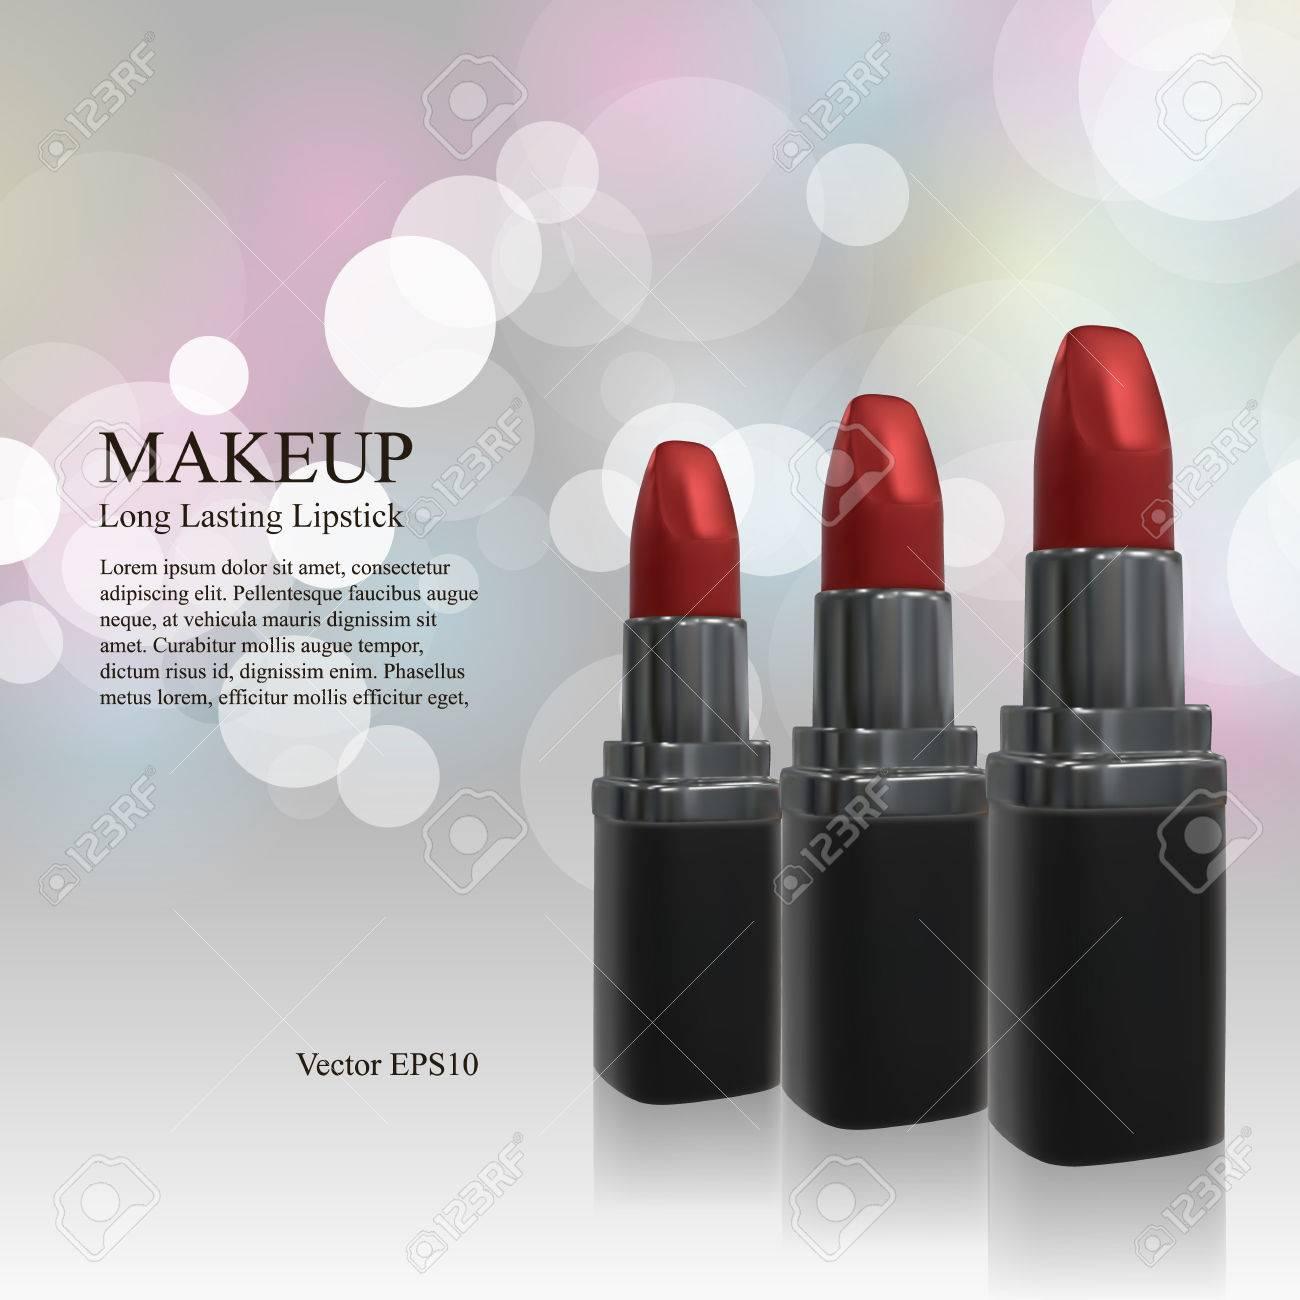 makeup ads template 3d